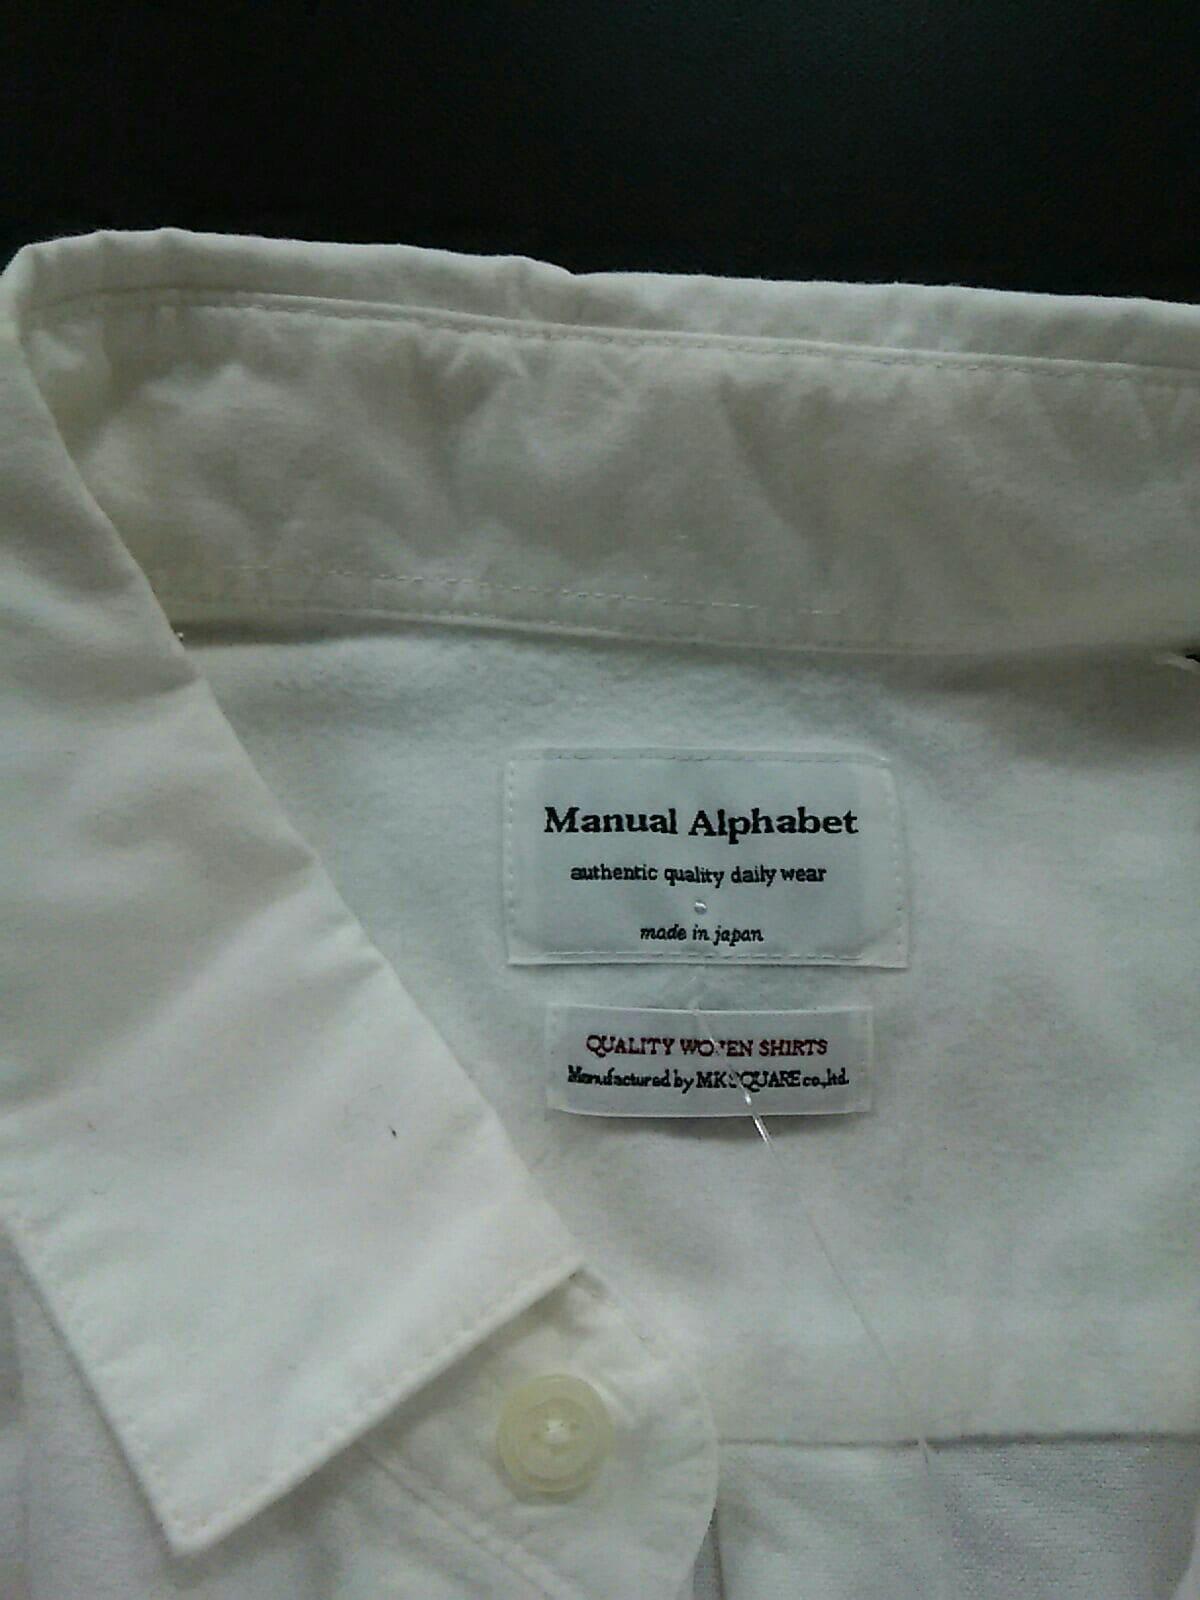 ManualAlphabet(マニュアルアルファベット)のシャツブラウス